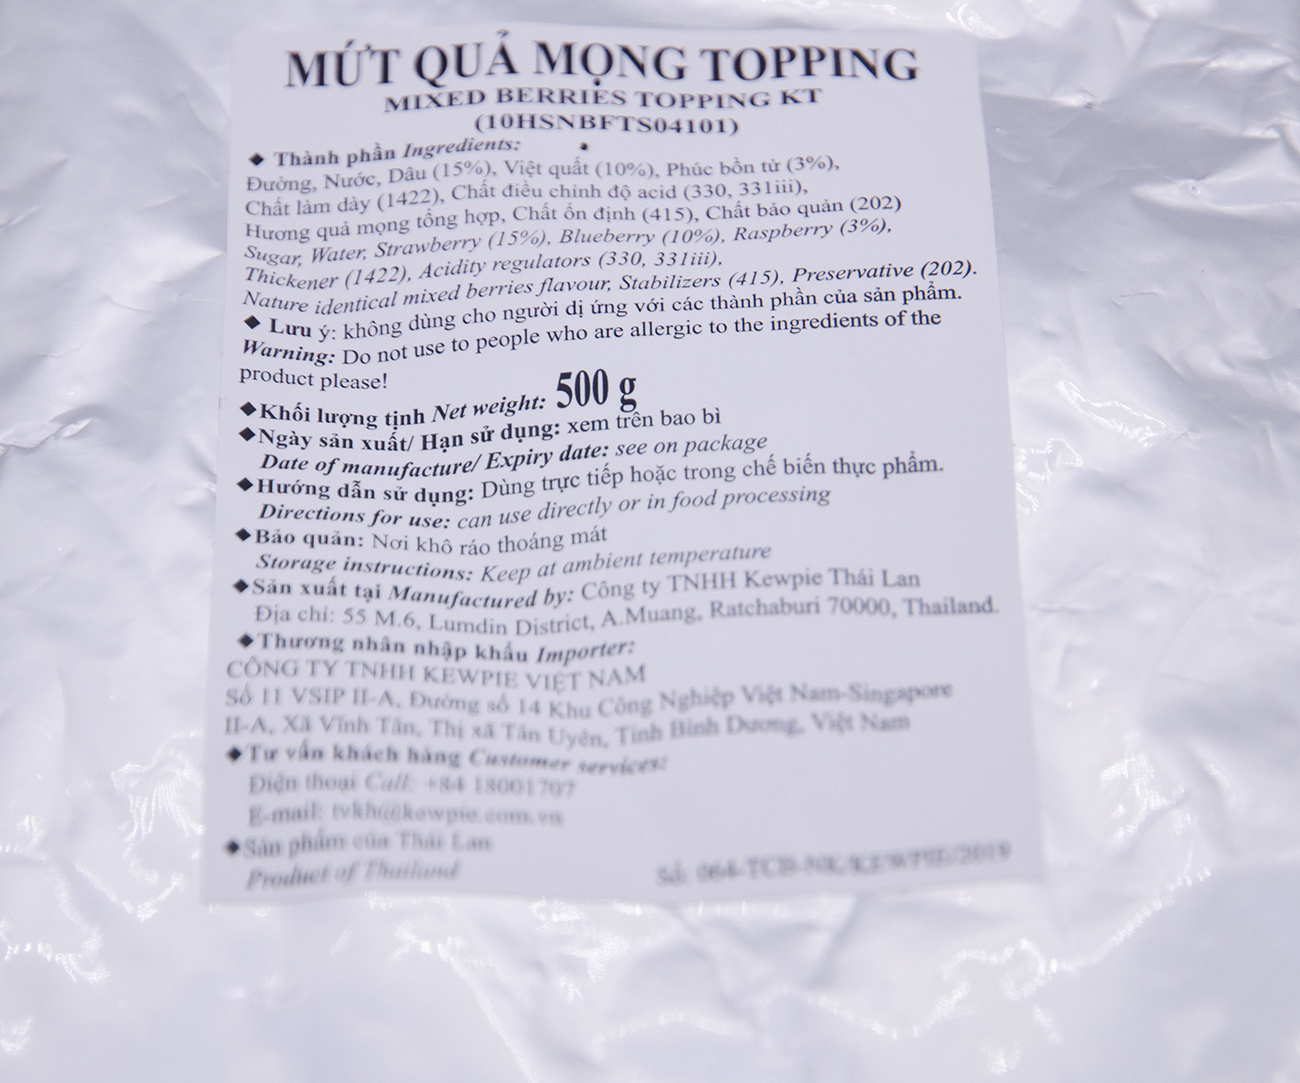 MUT_QUA_MONG_TOPPING